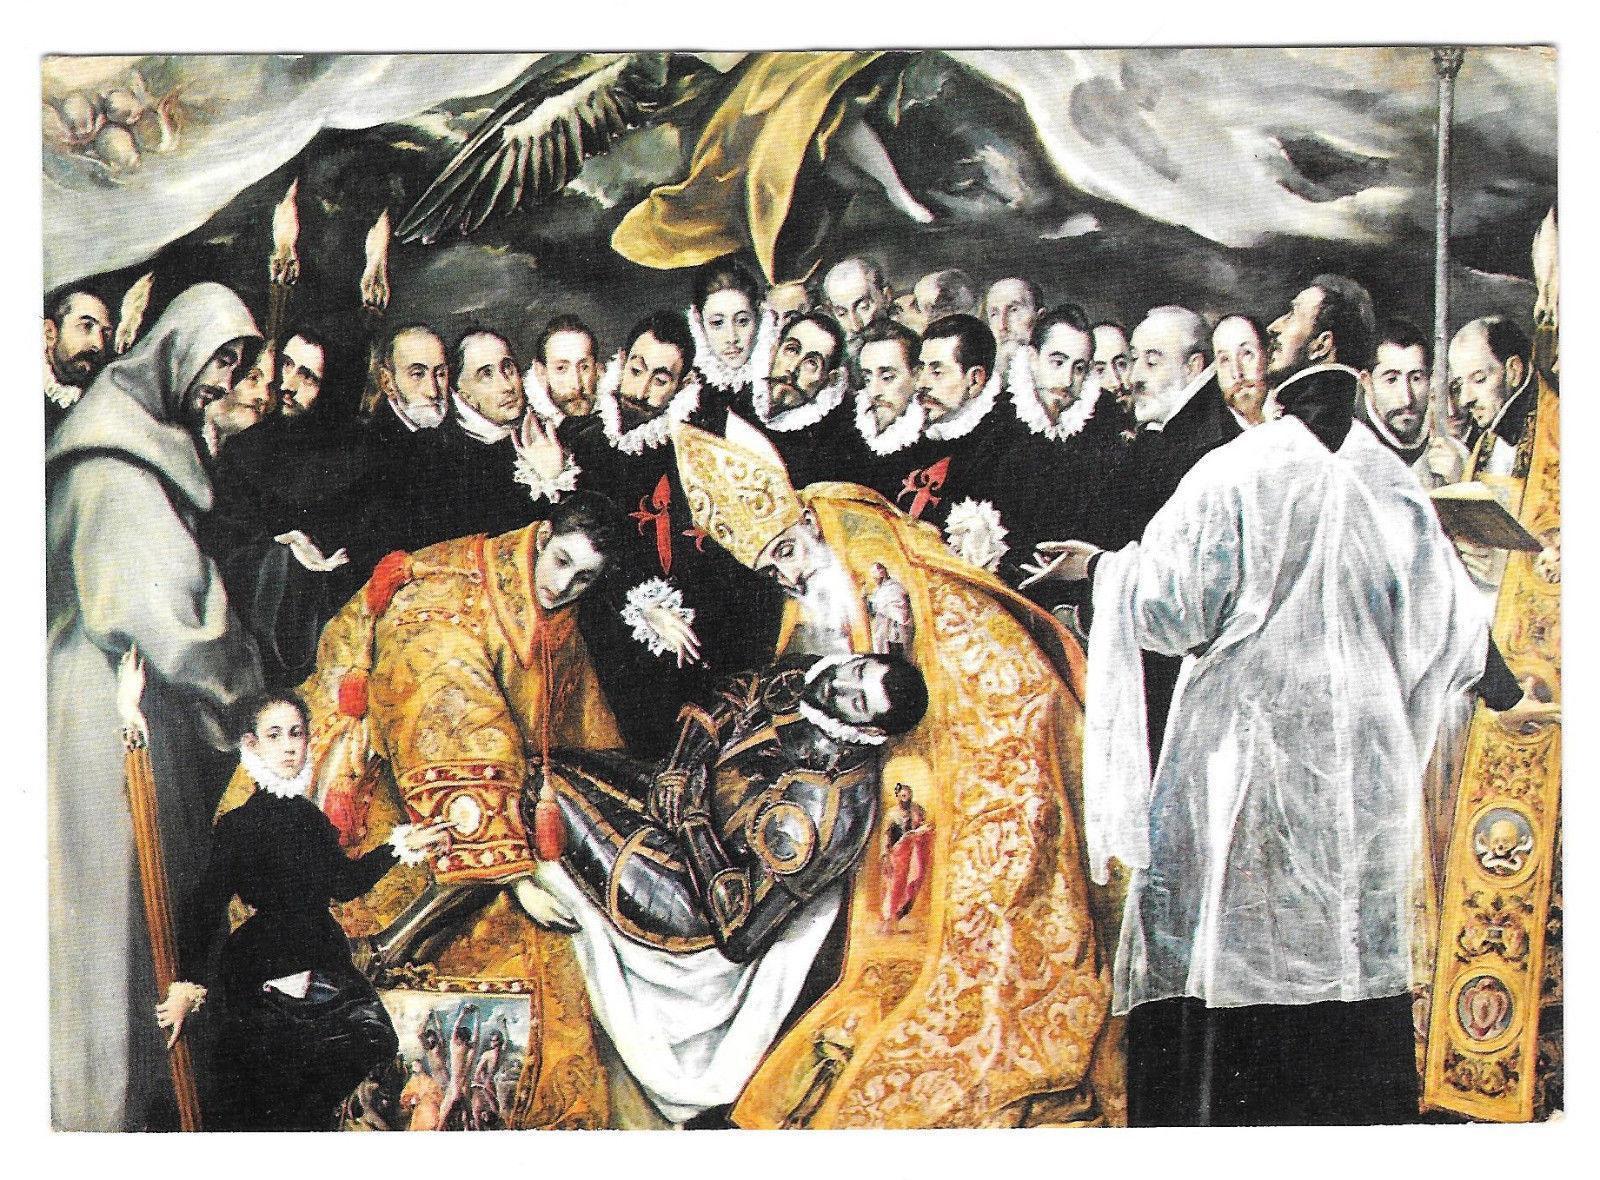 El Greco Burial of Count of Orgaz Detail Santo Tome Church Vtg Art Postcard 4X6